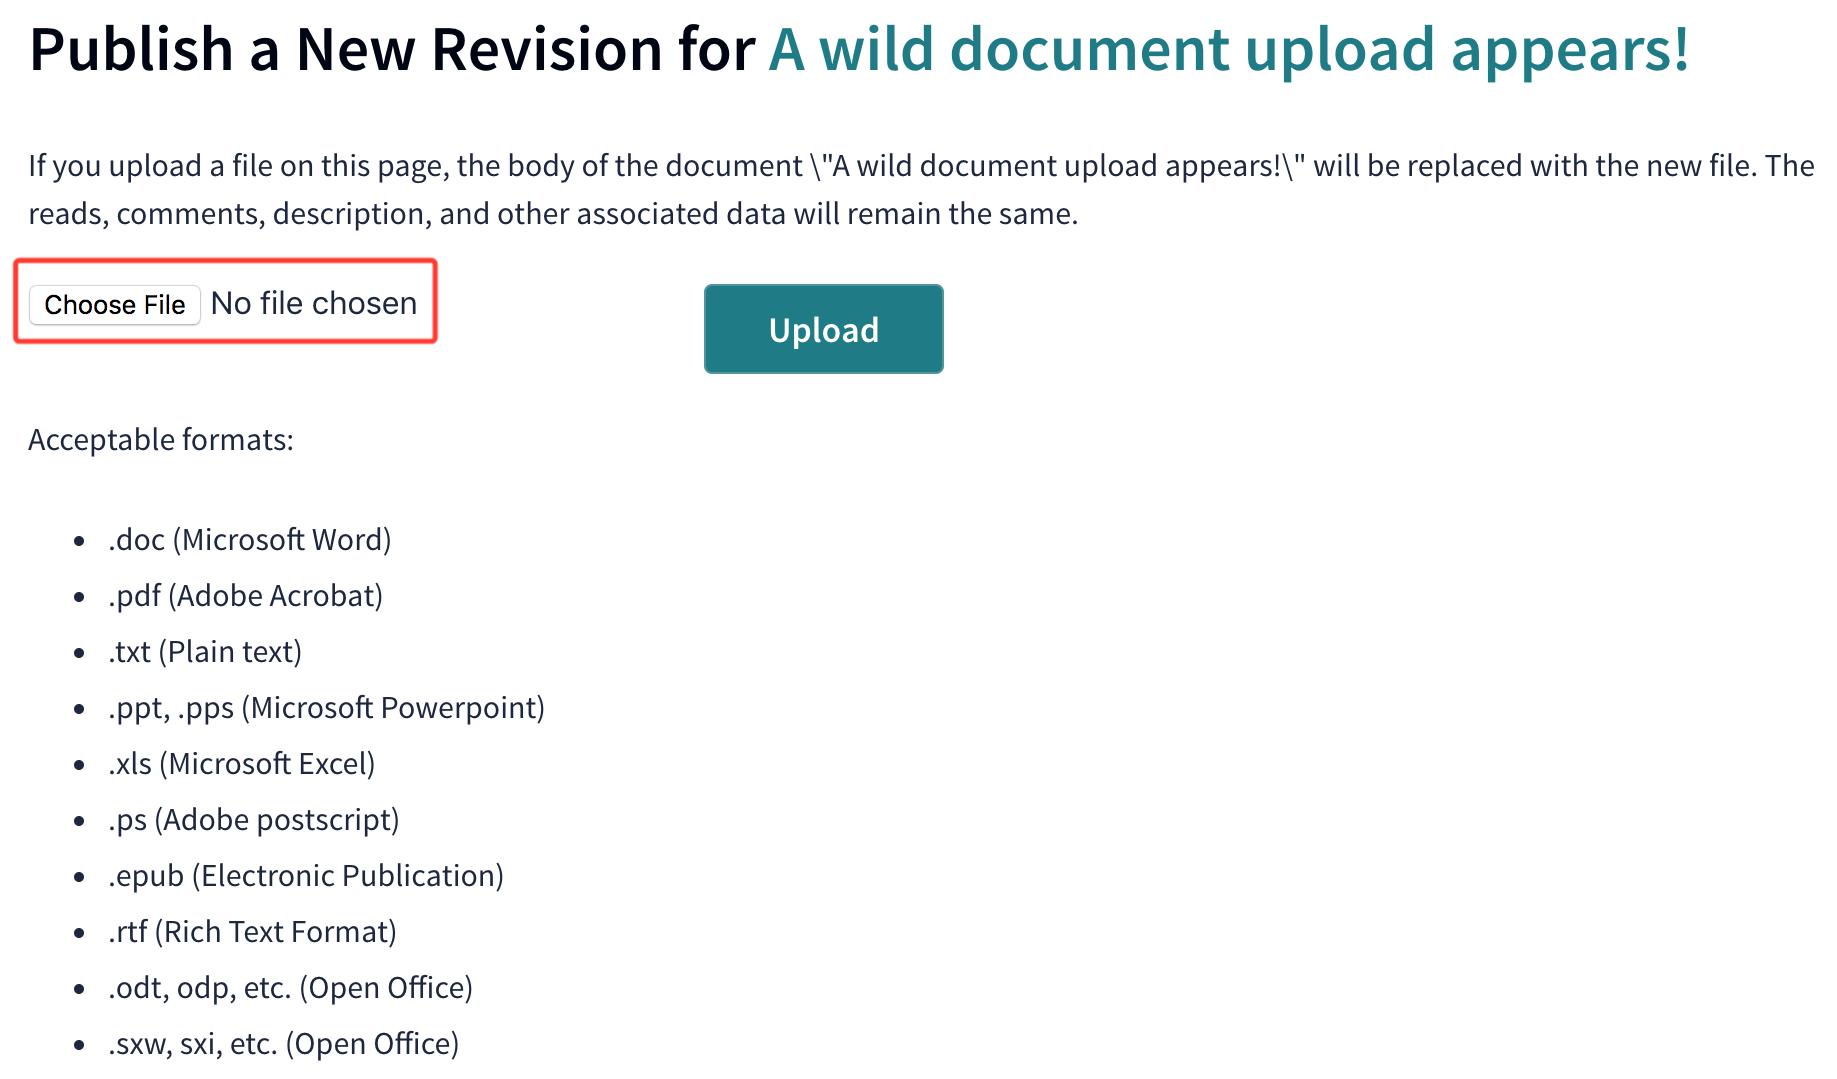 Uploading_documents_-_Choose_file.png